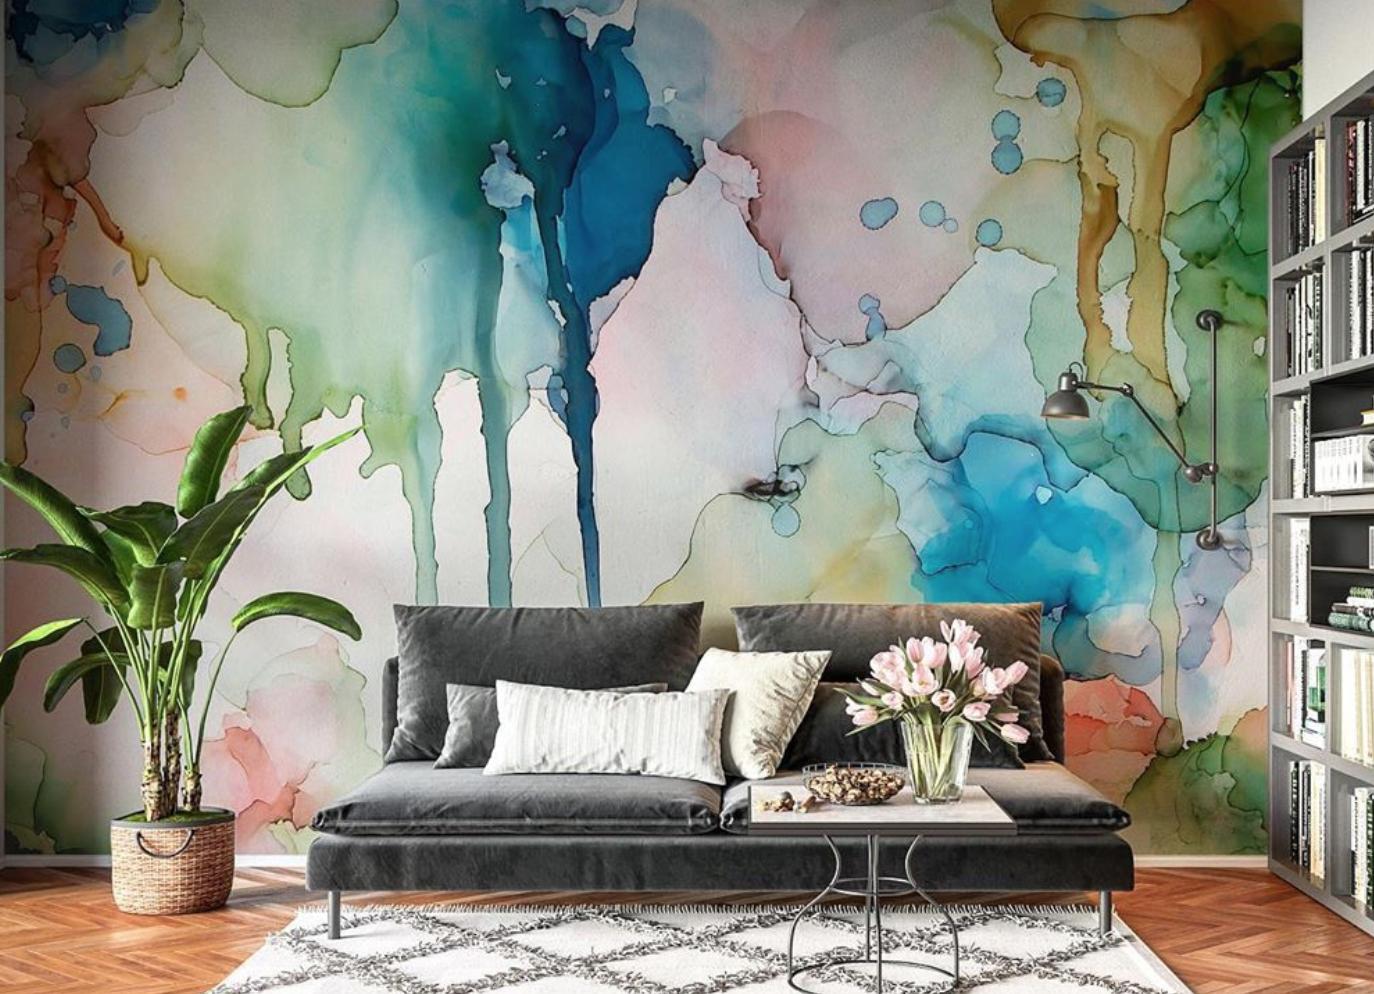 water-color inspired wallpaper design by amanda moody